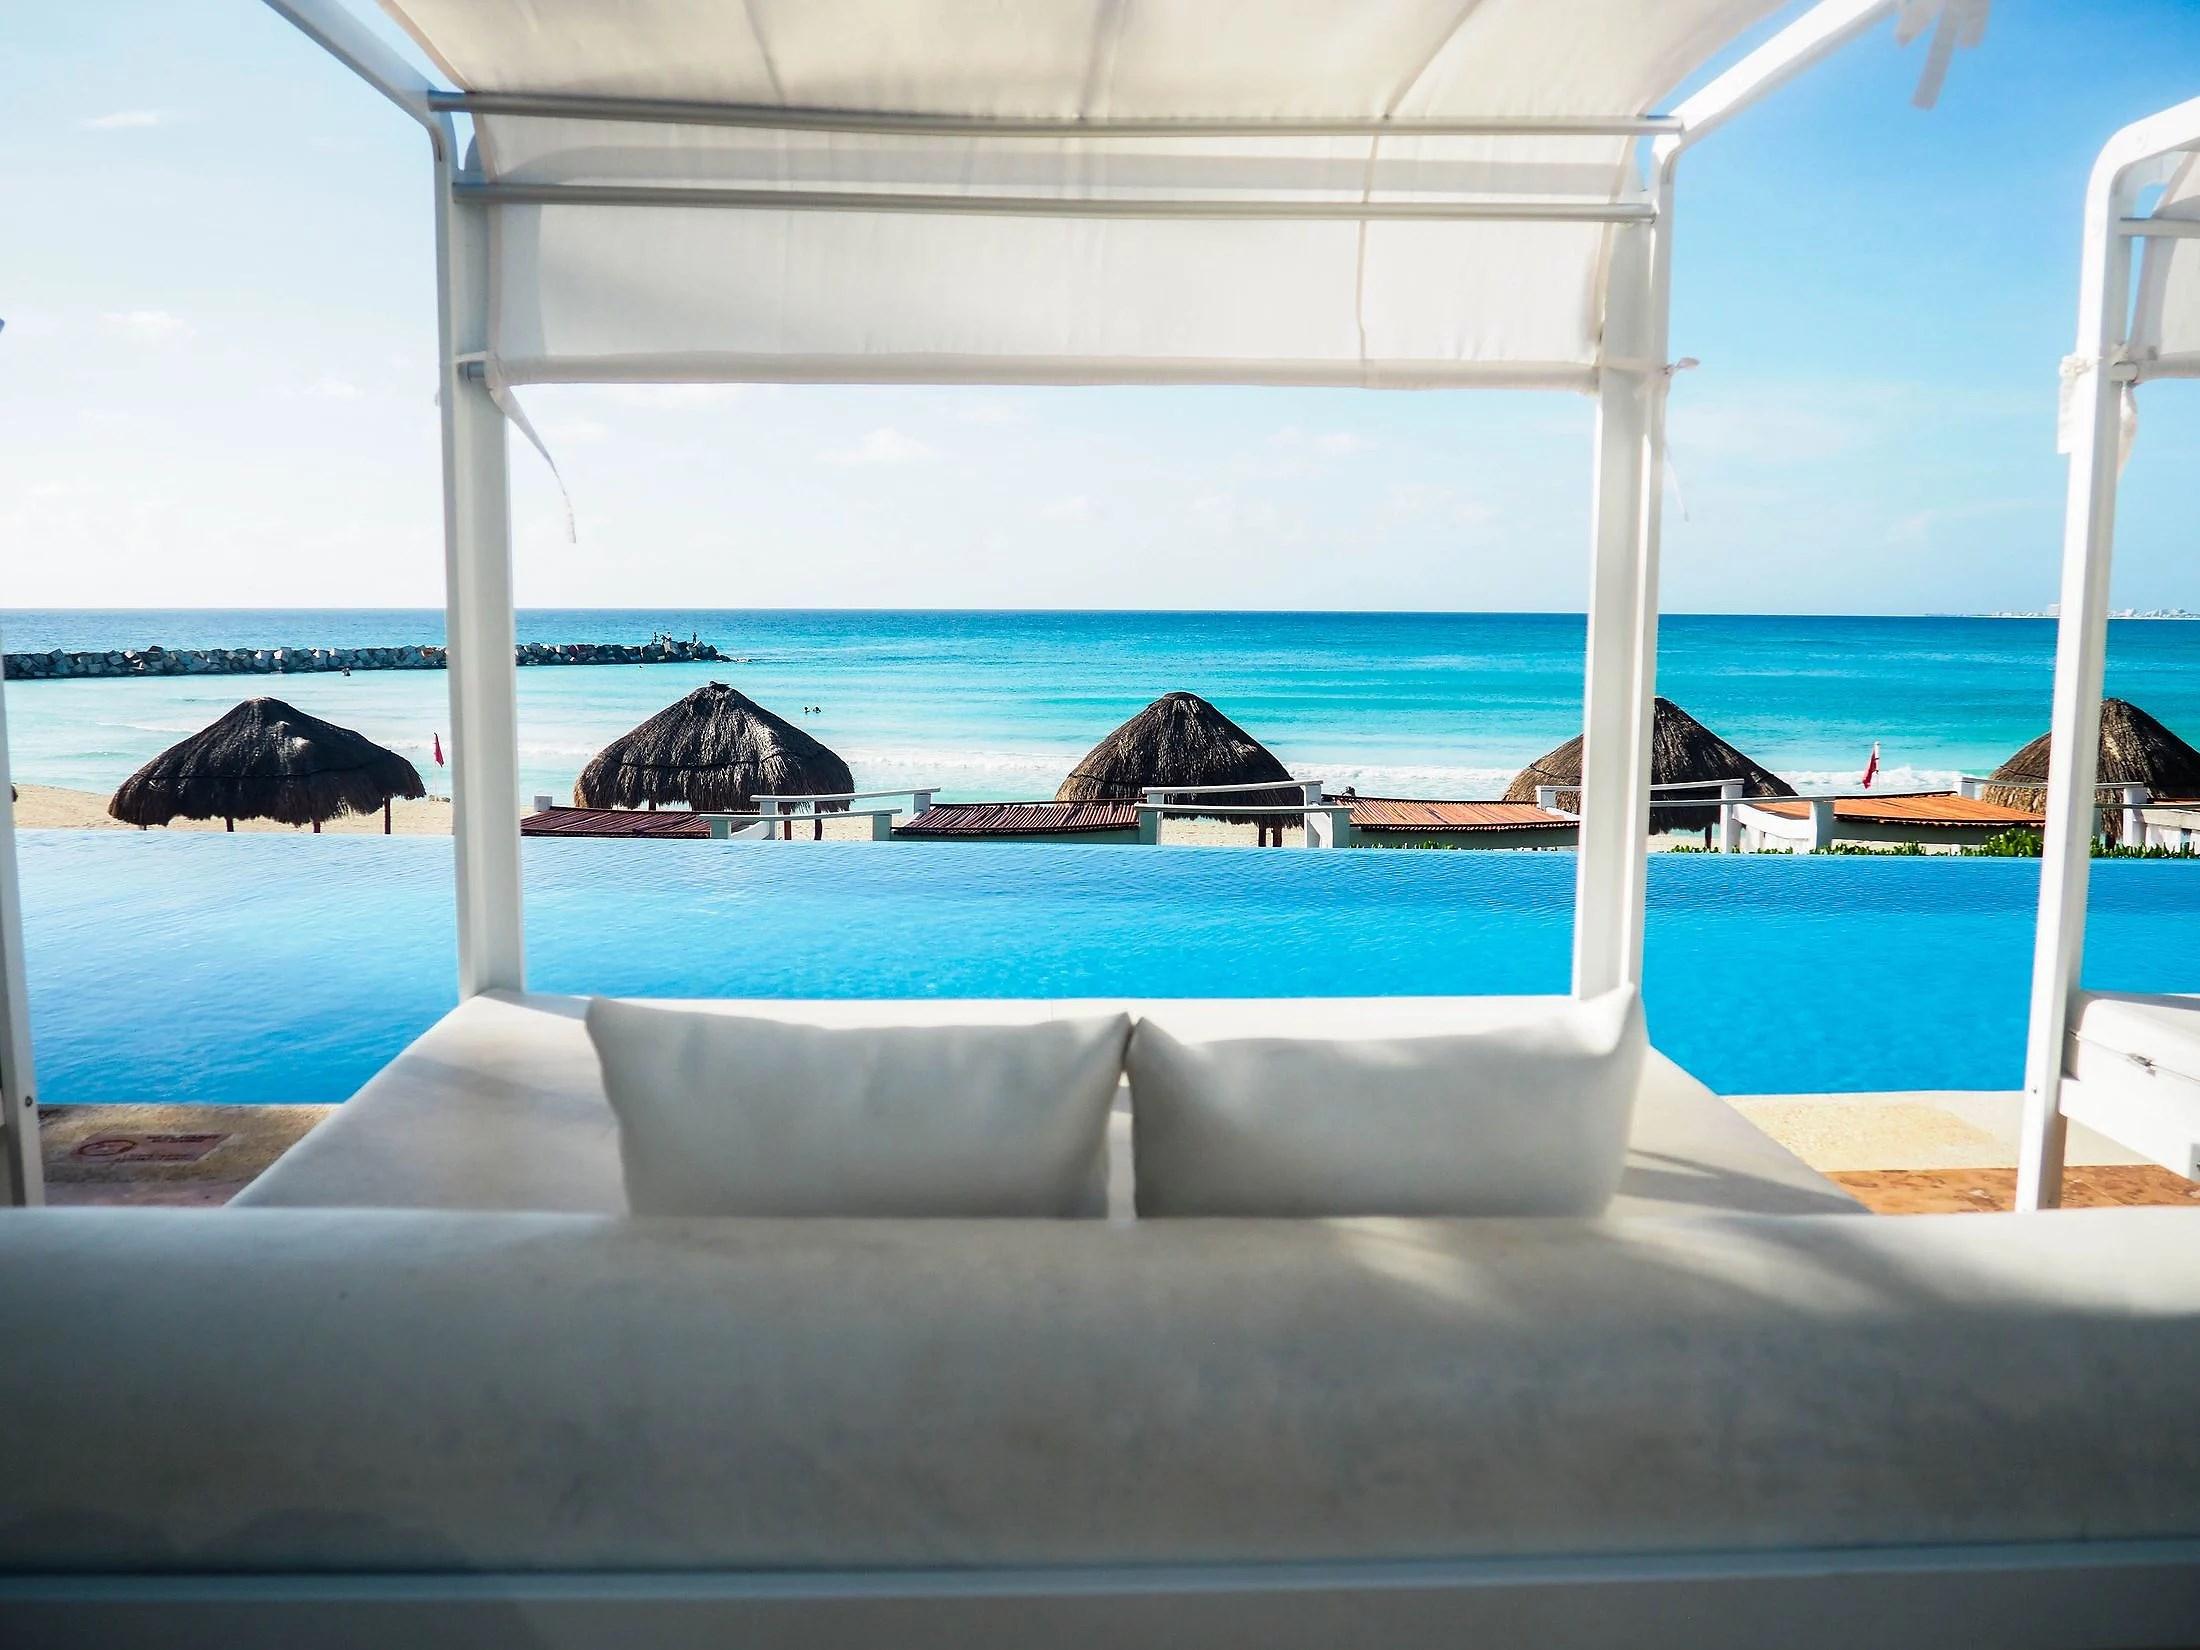 den virkelige Cancún